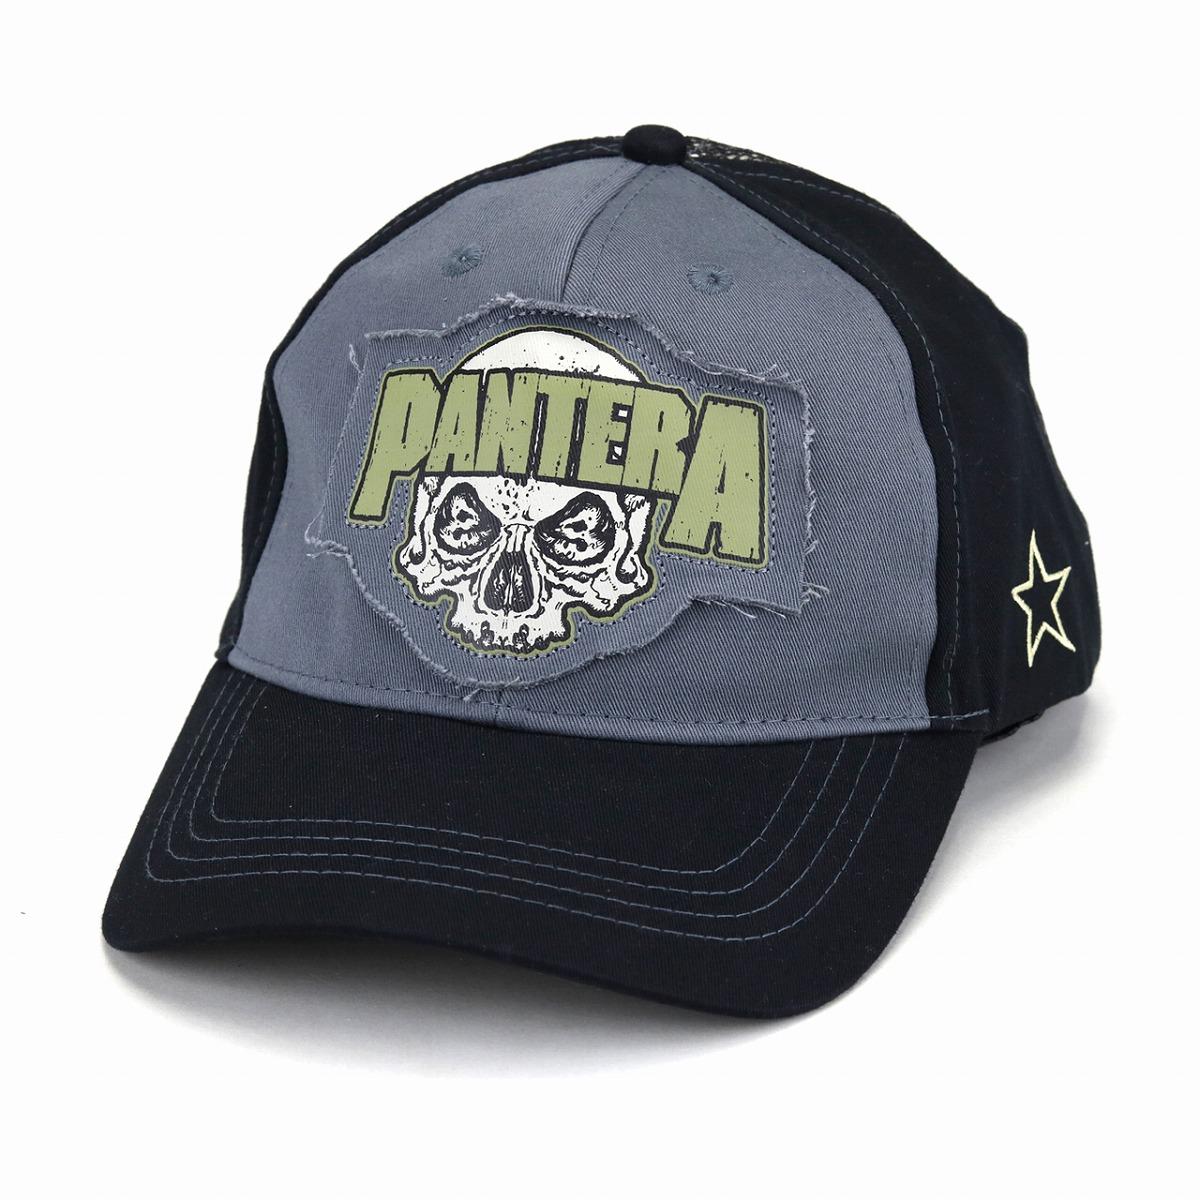 8d38a5167df ELEHELM HAT STORE  It is a present in pantera hat cap heavy metal ...